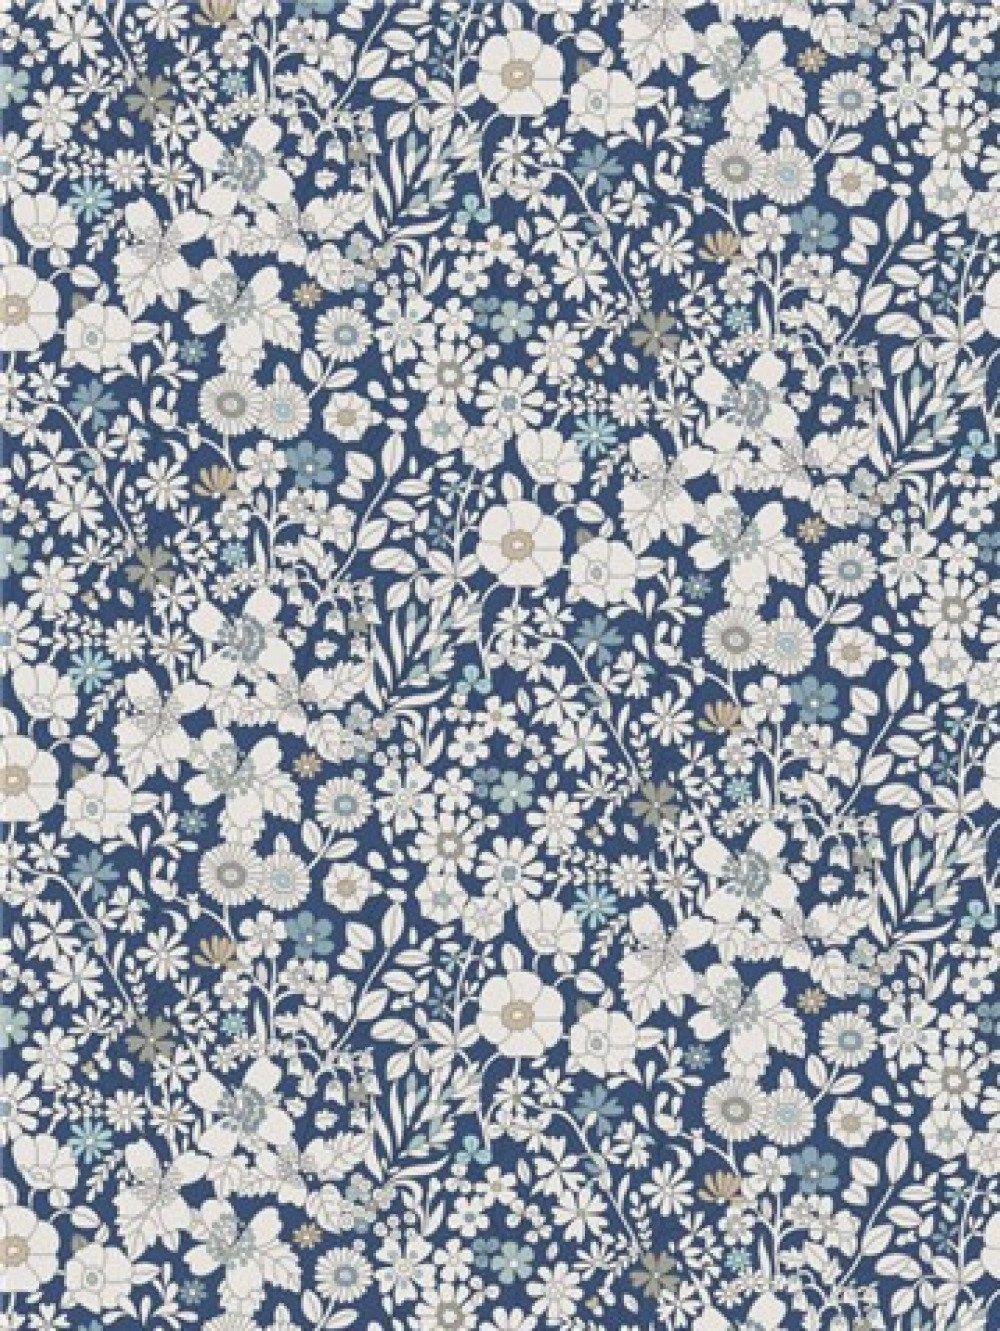 Noeud papillon en bois et tissu liberty anglais Junes's Meadow bleu navy